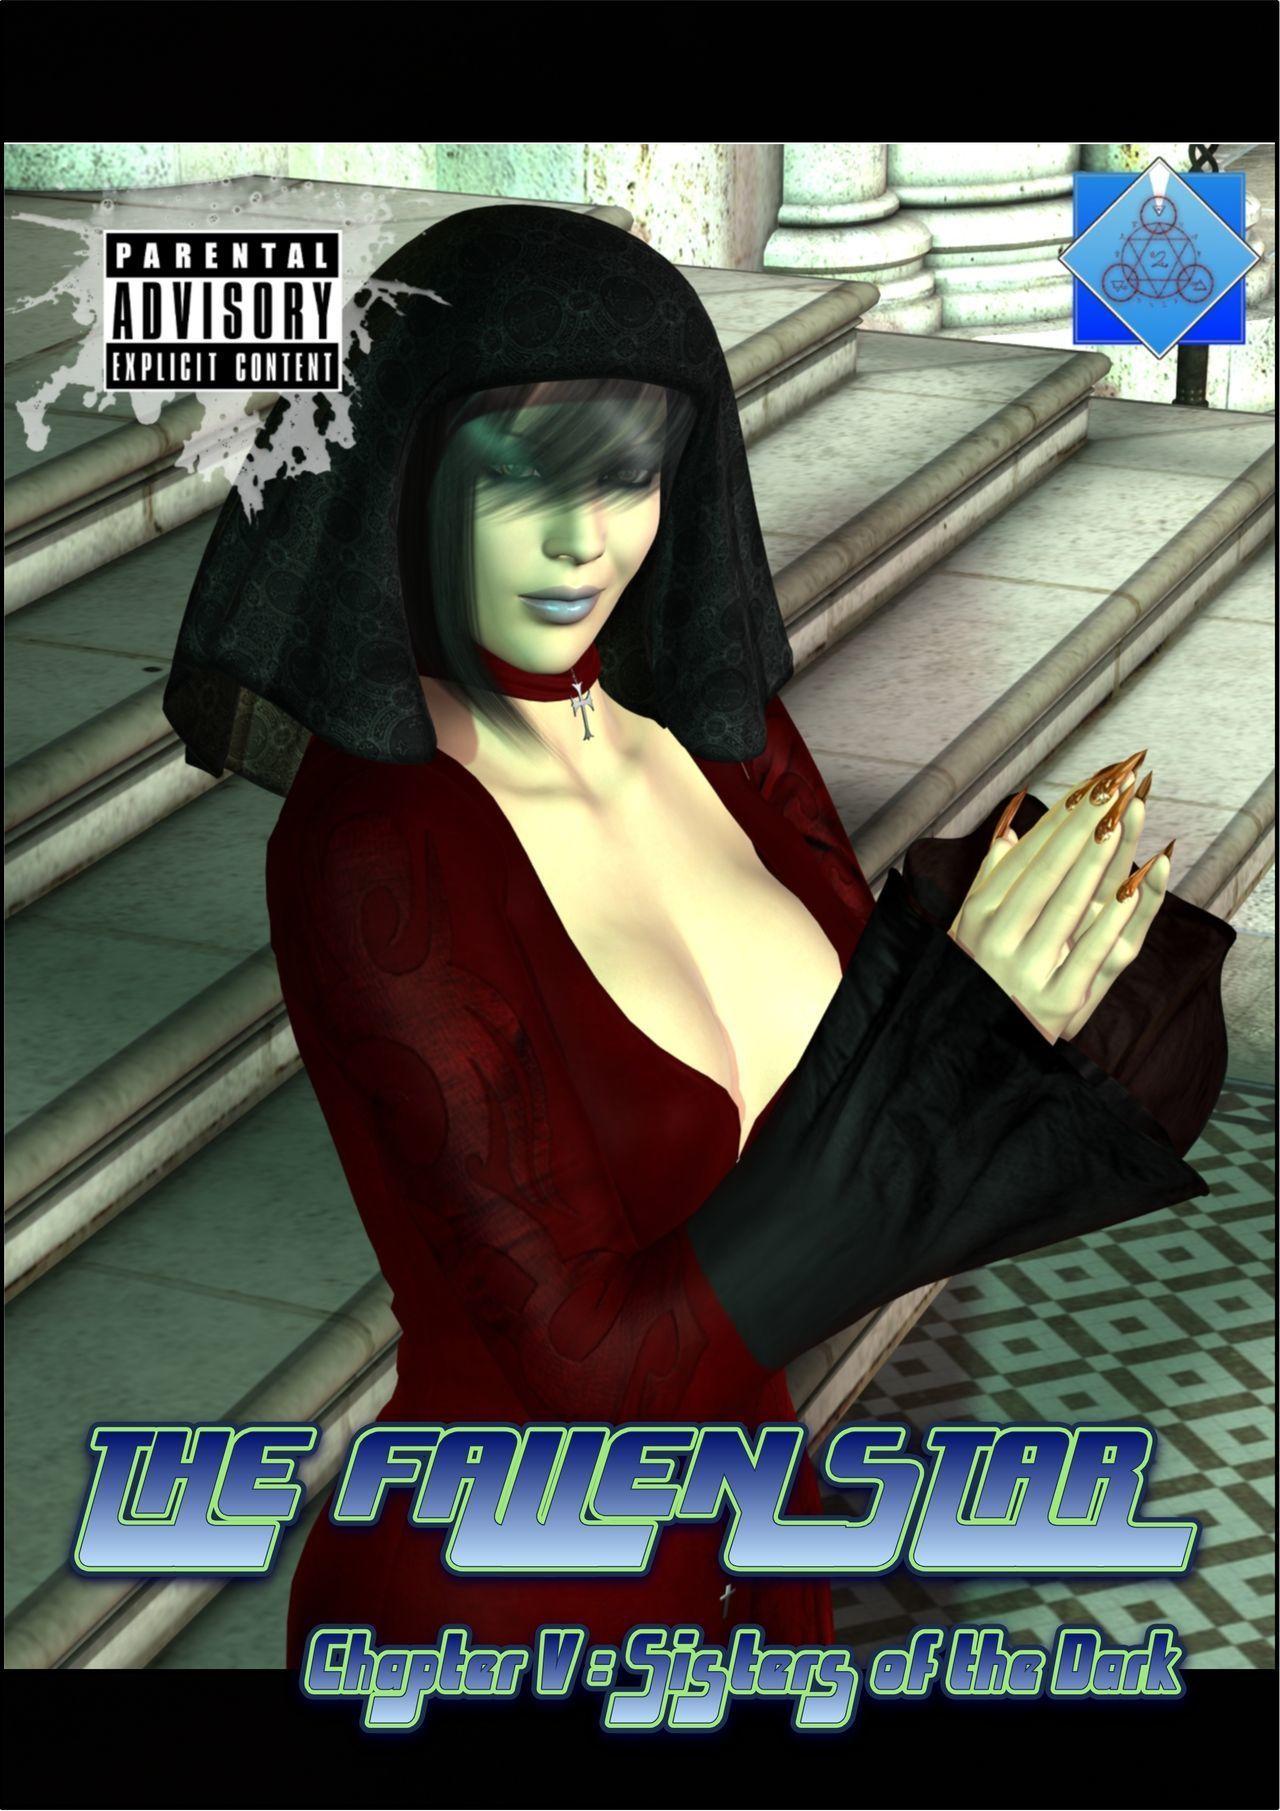 [Shinra-kun] The Fallen Star Ch. 5: Sisters of the Dark